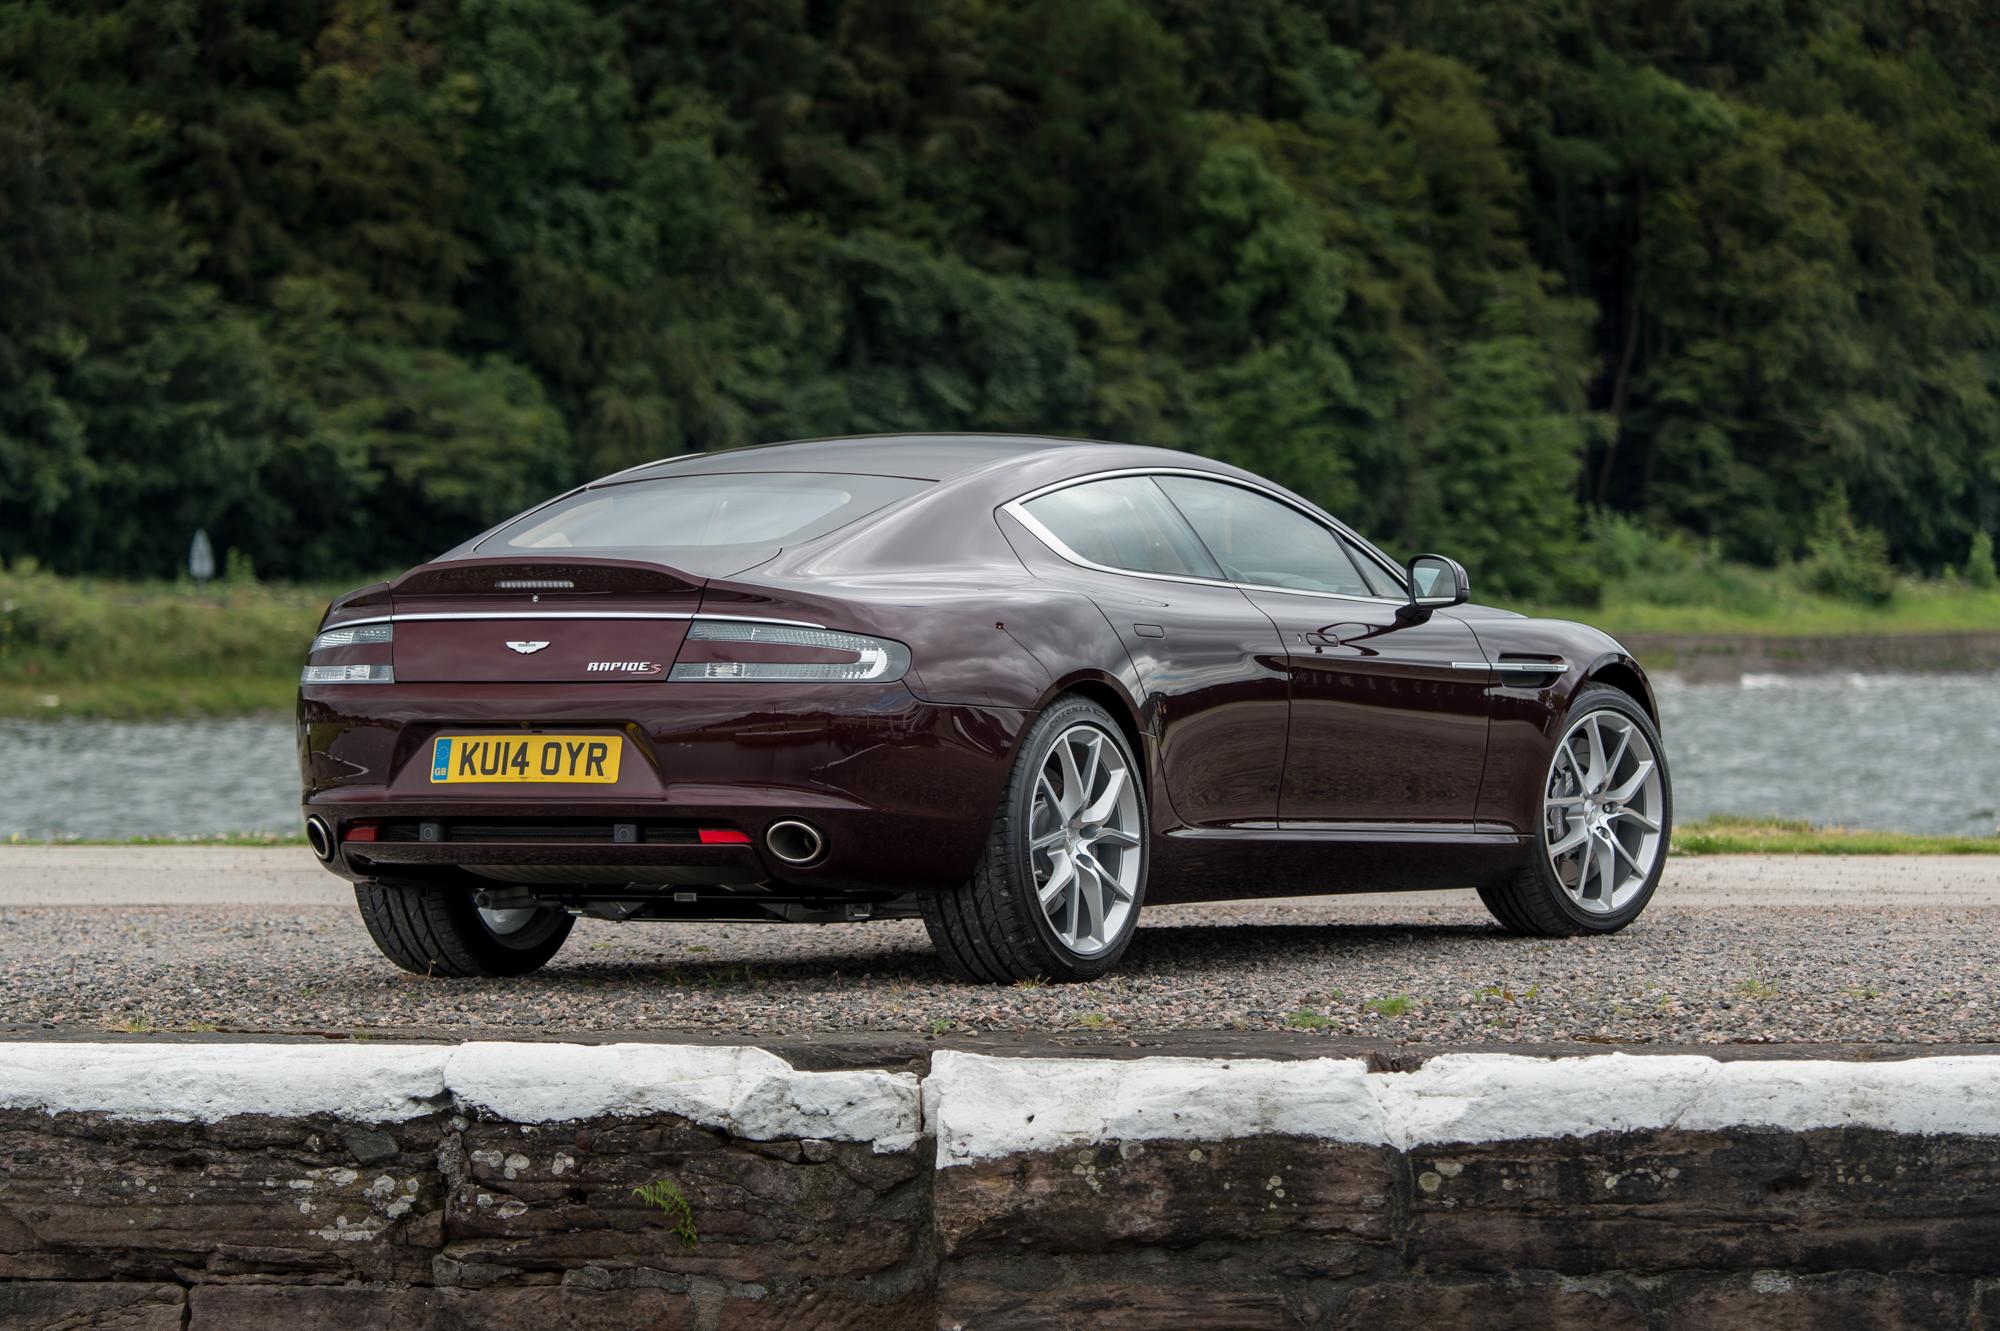 Aston Martin To Replace Rapide With New Lagonda Sedan